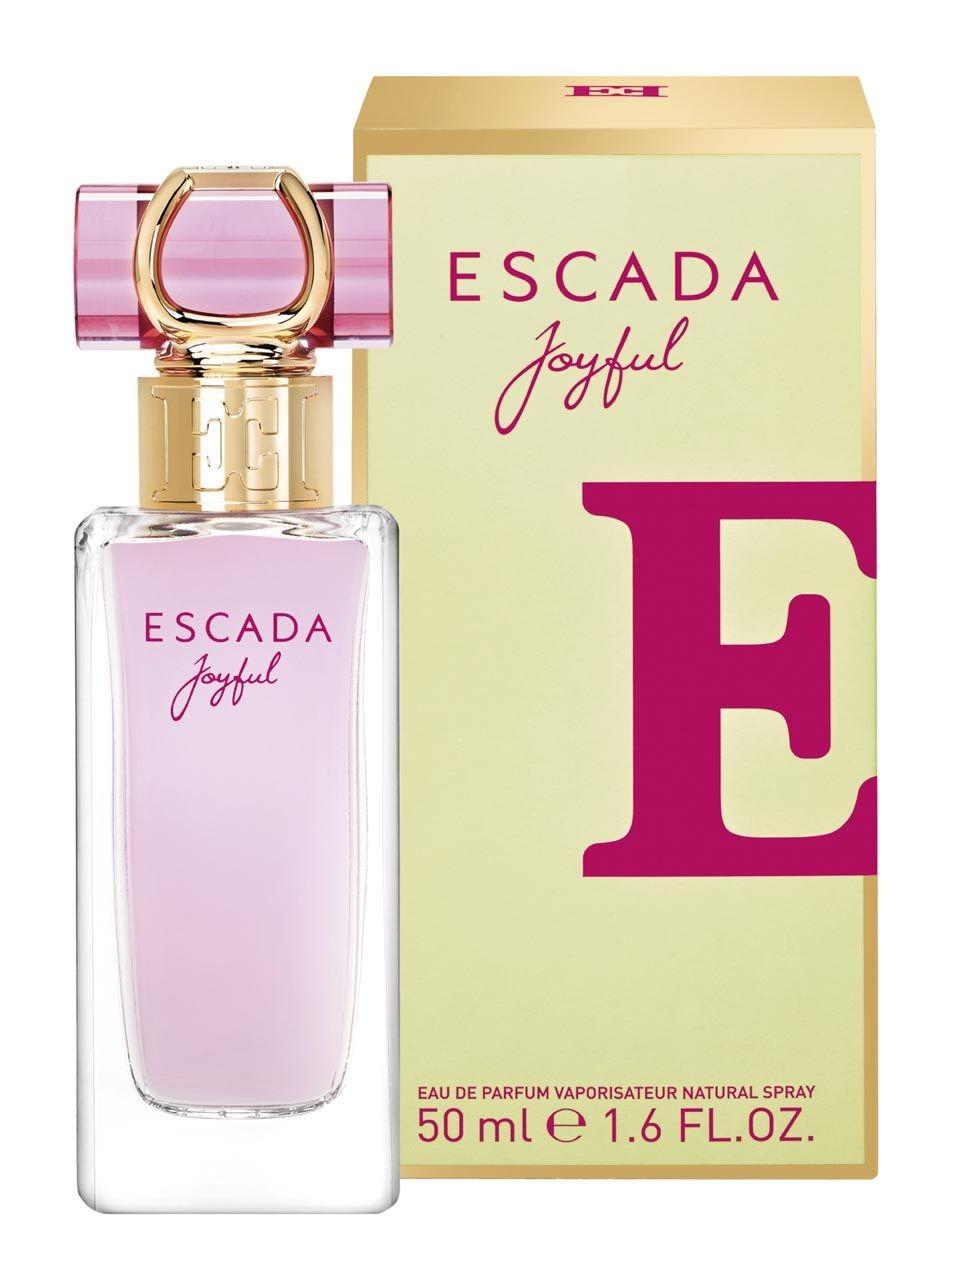 Escada Perfume Canada